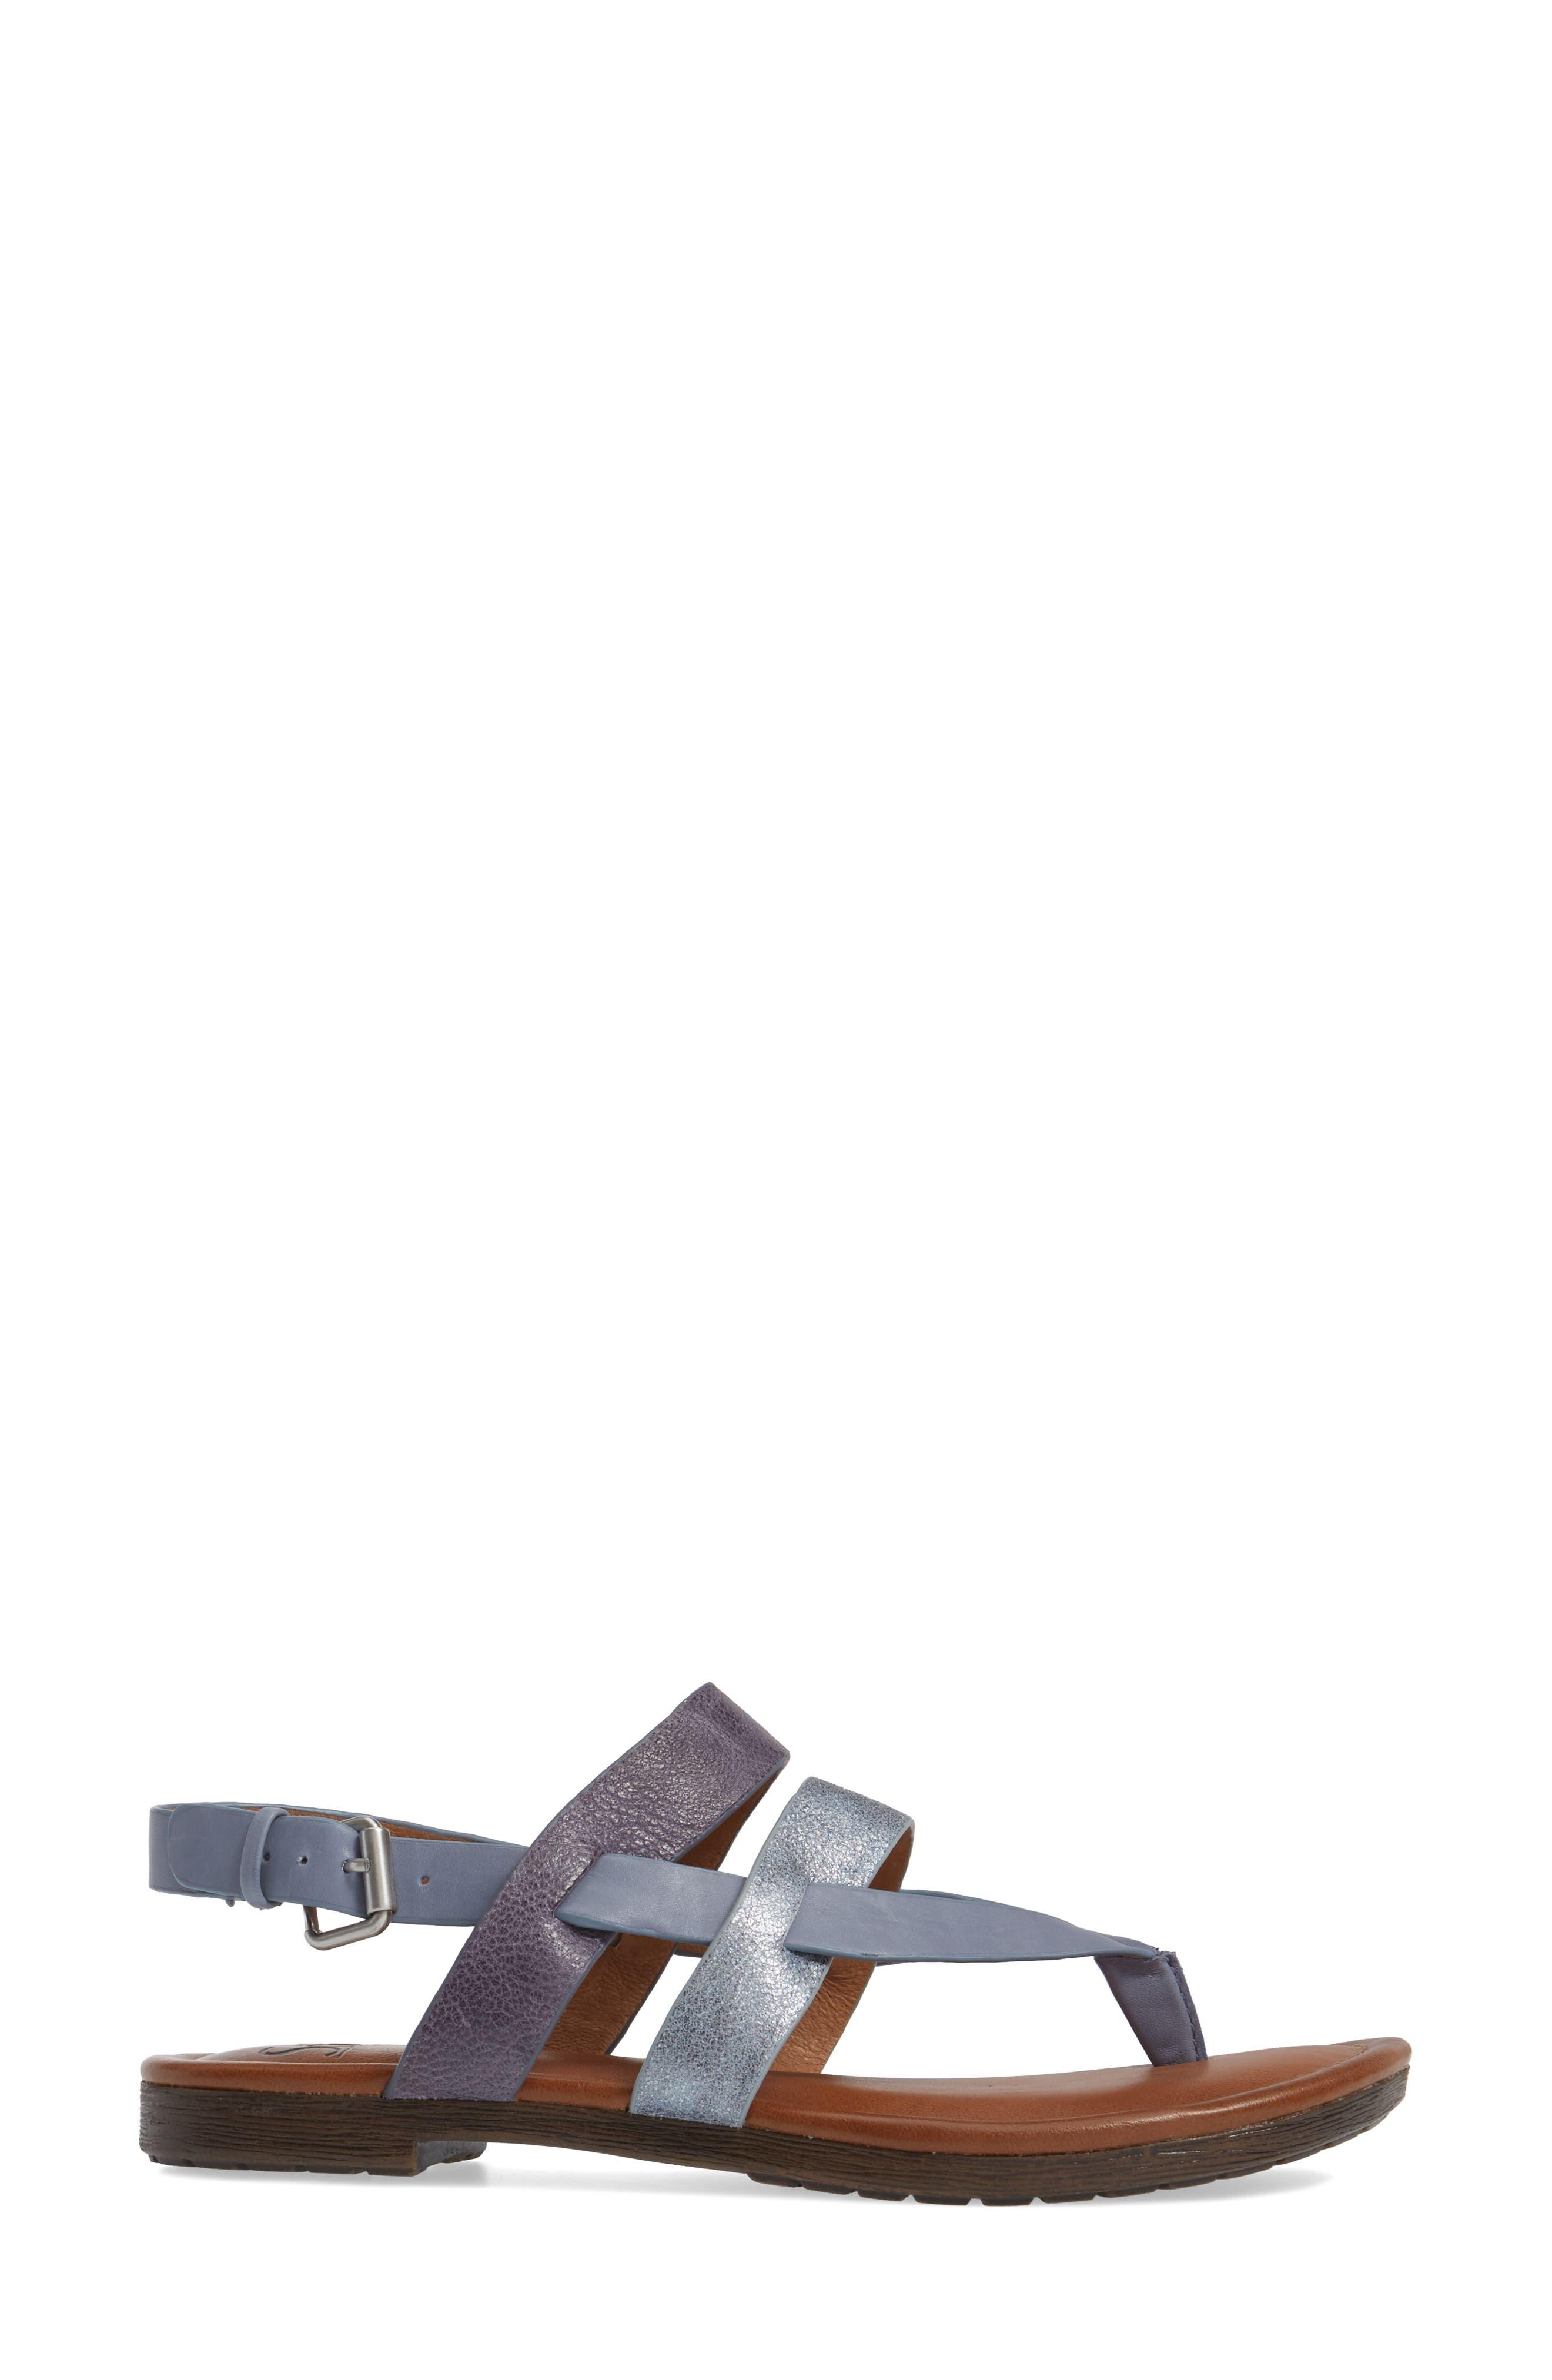 Bena Strappy Sandal,                             Alternate thumbnail 3, color,                             421